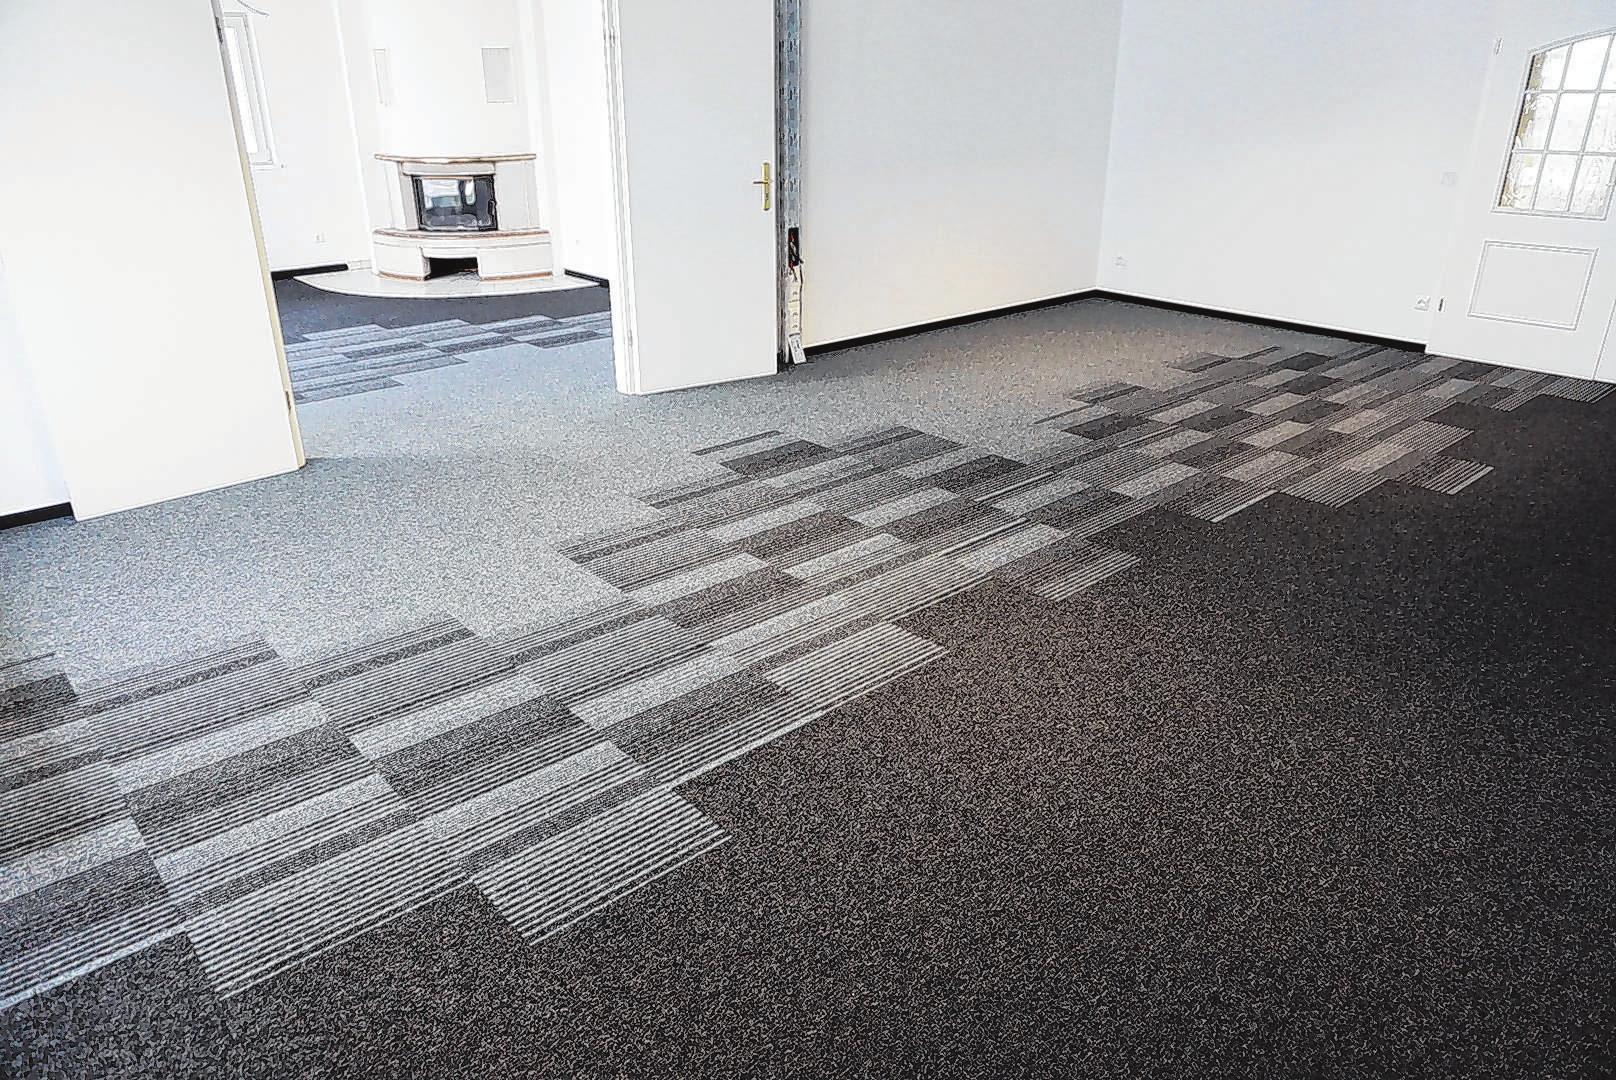 Referenzobjekt: Kreative Teppichverlegung in Gewerberäumen. Foto: Jens Krüger